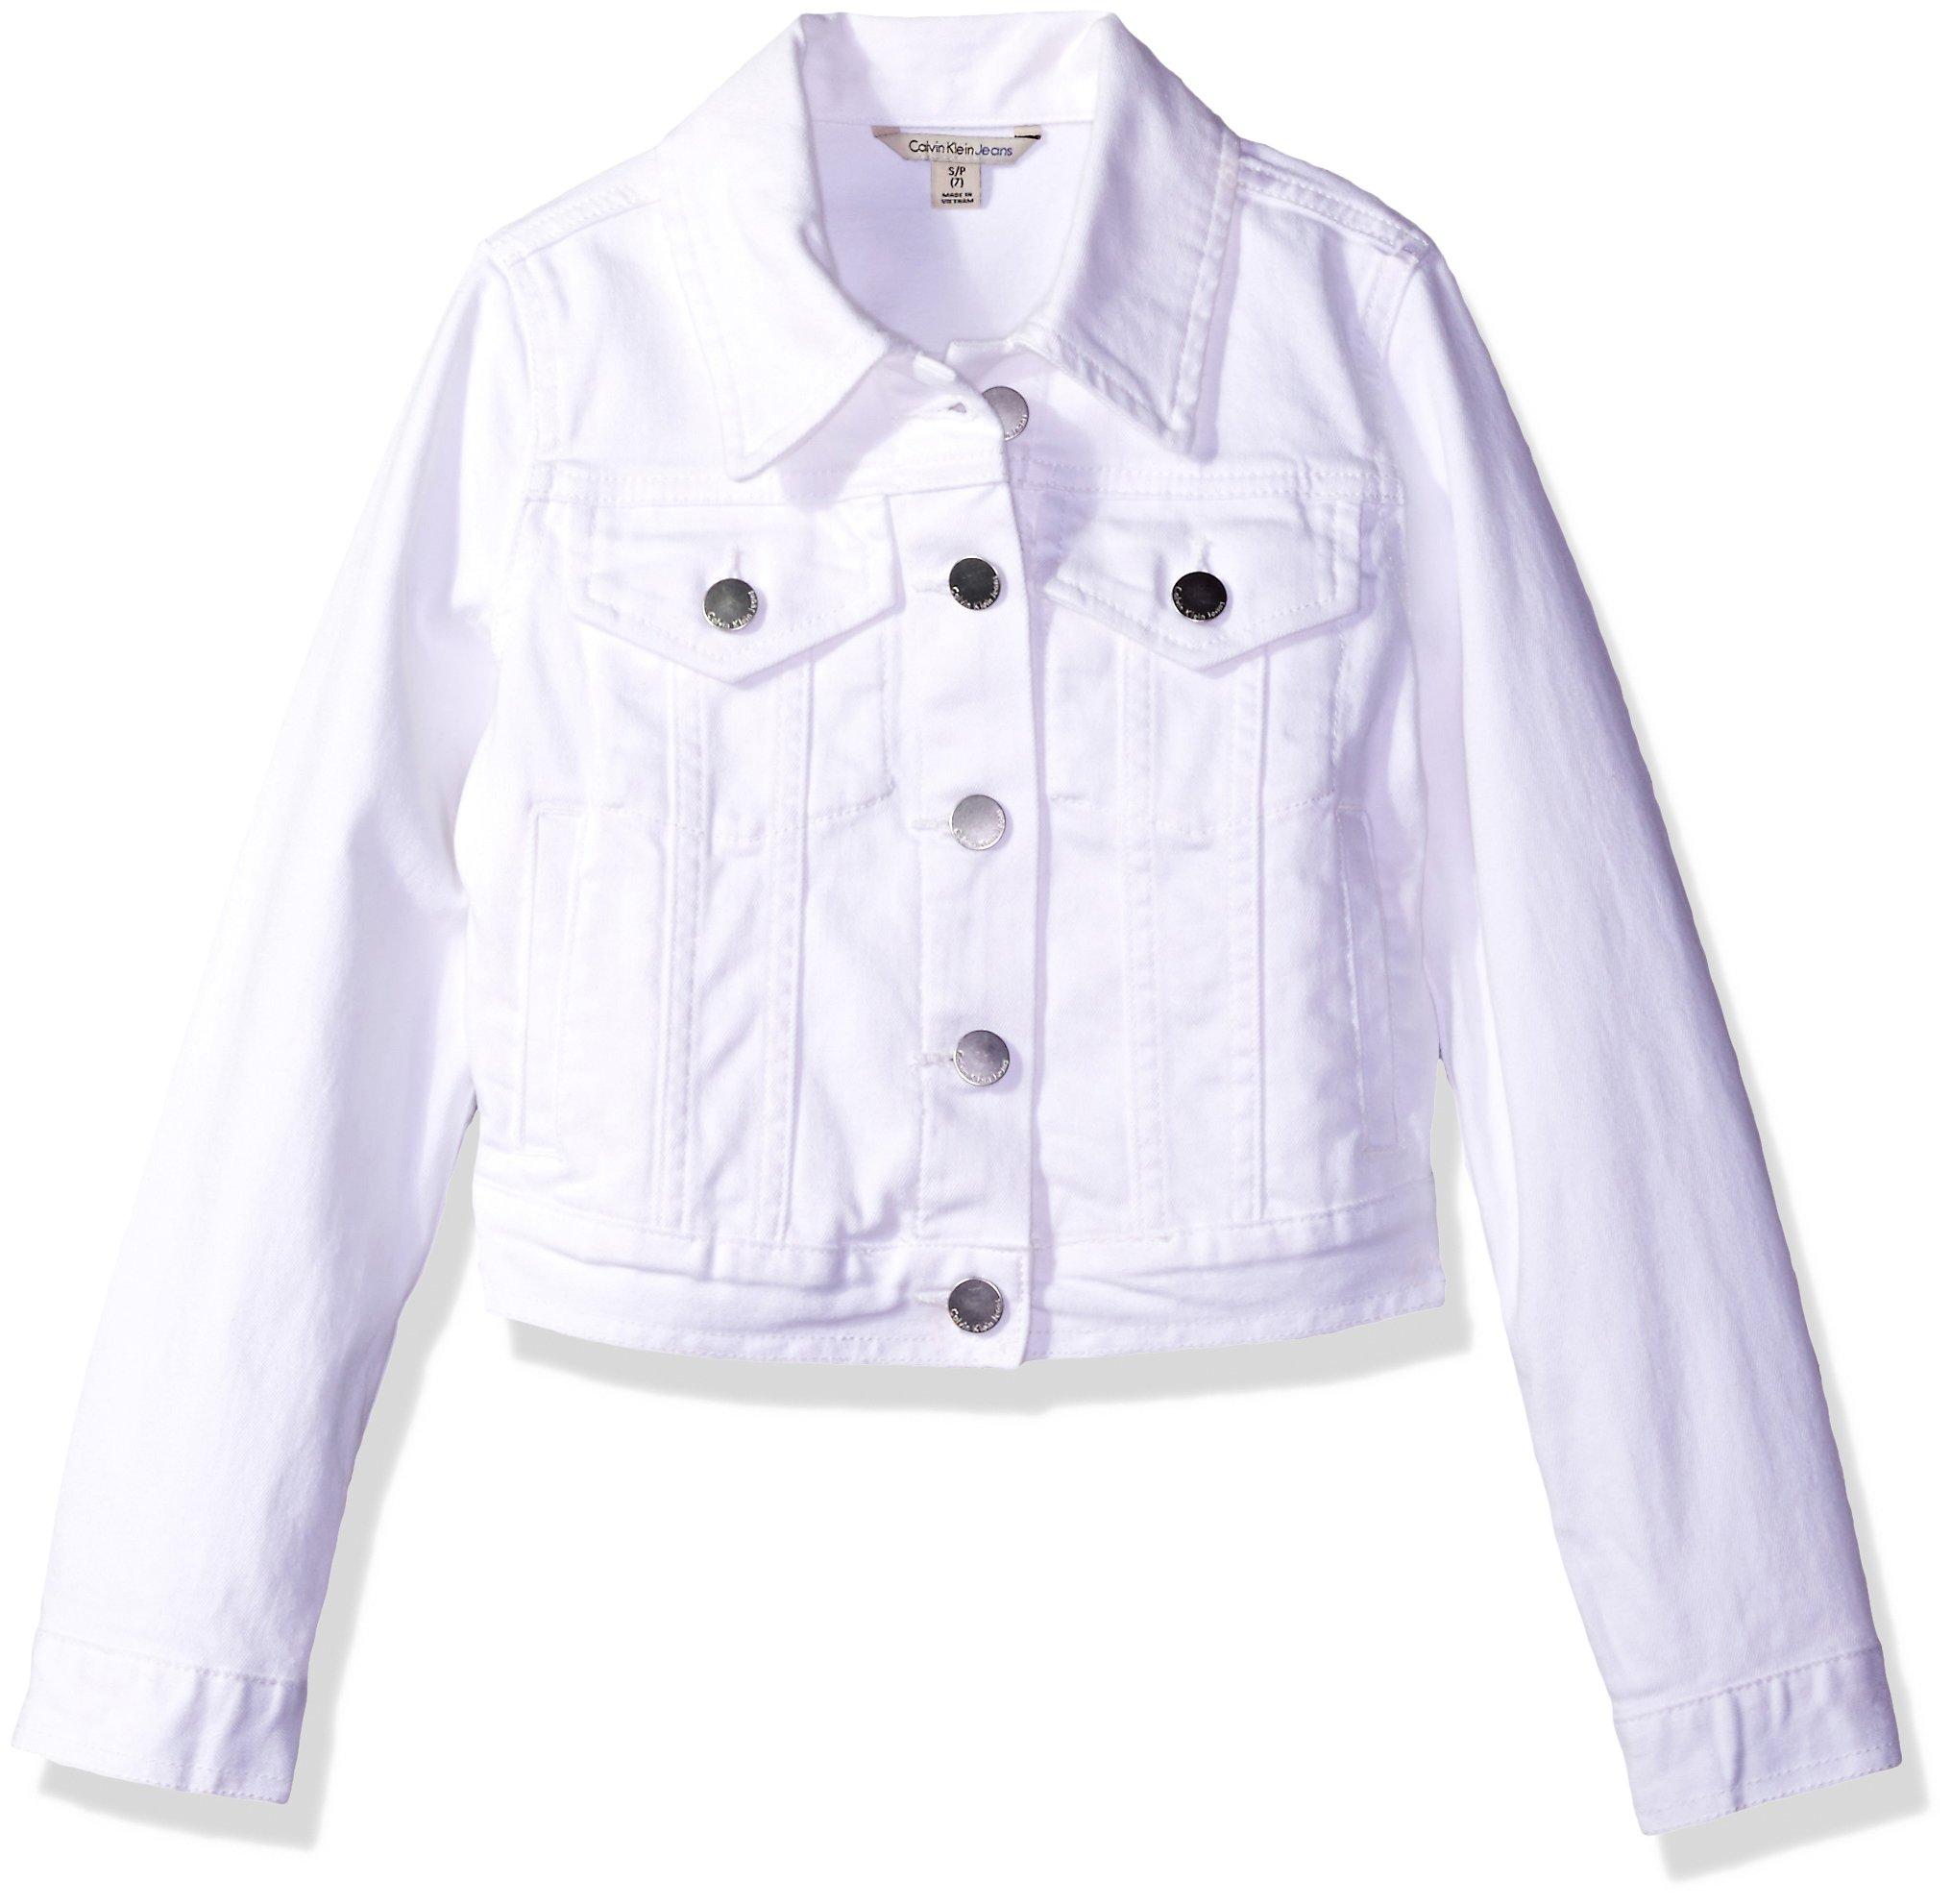 Calvin Klein Girls' Big Denim Jacket, Whiteout, X-Large (16) by Calvin Klein